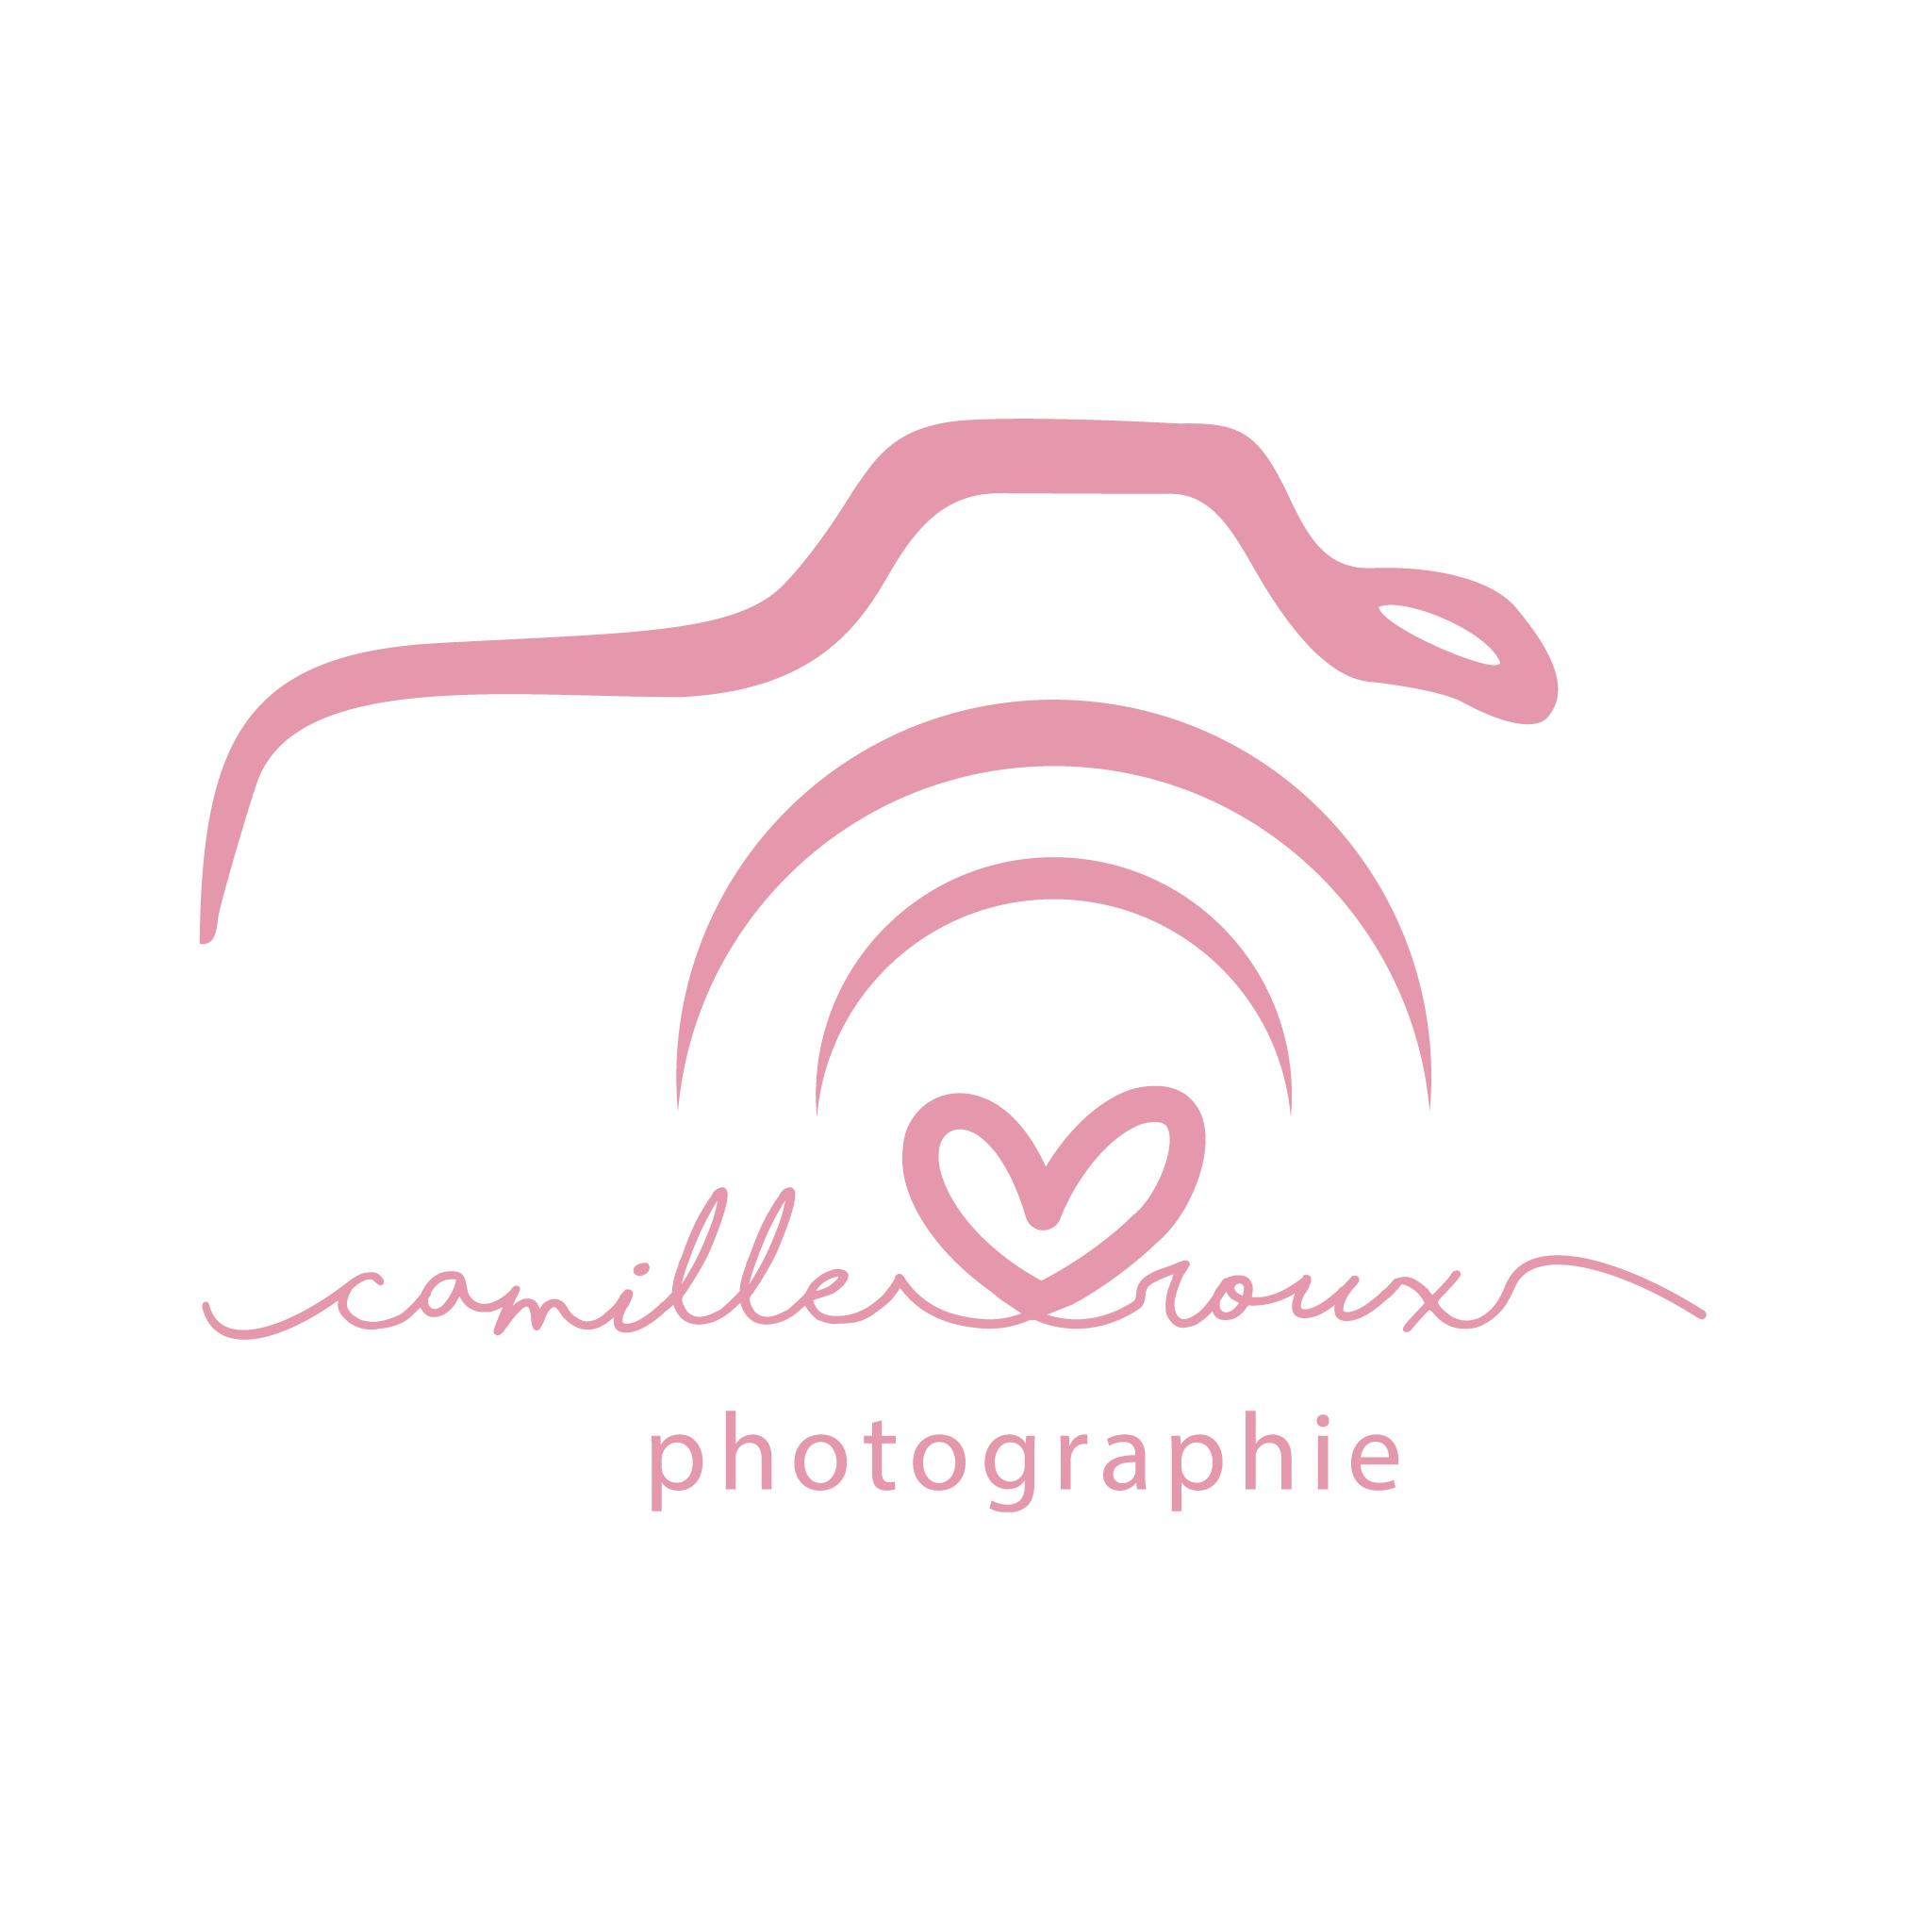 Camille Roux Photographie